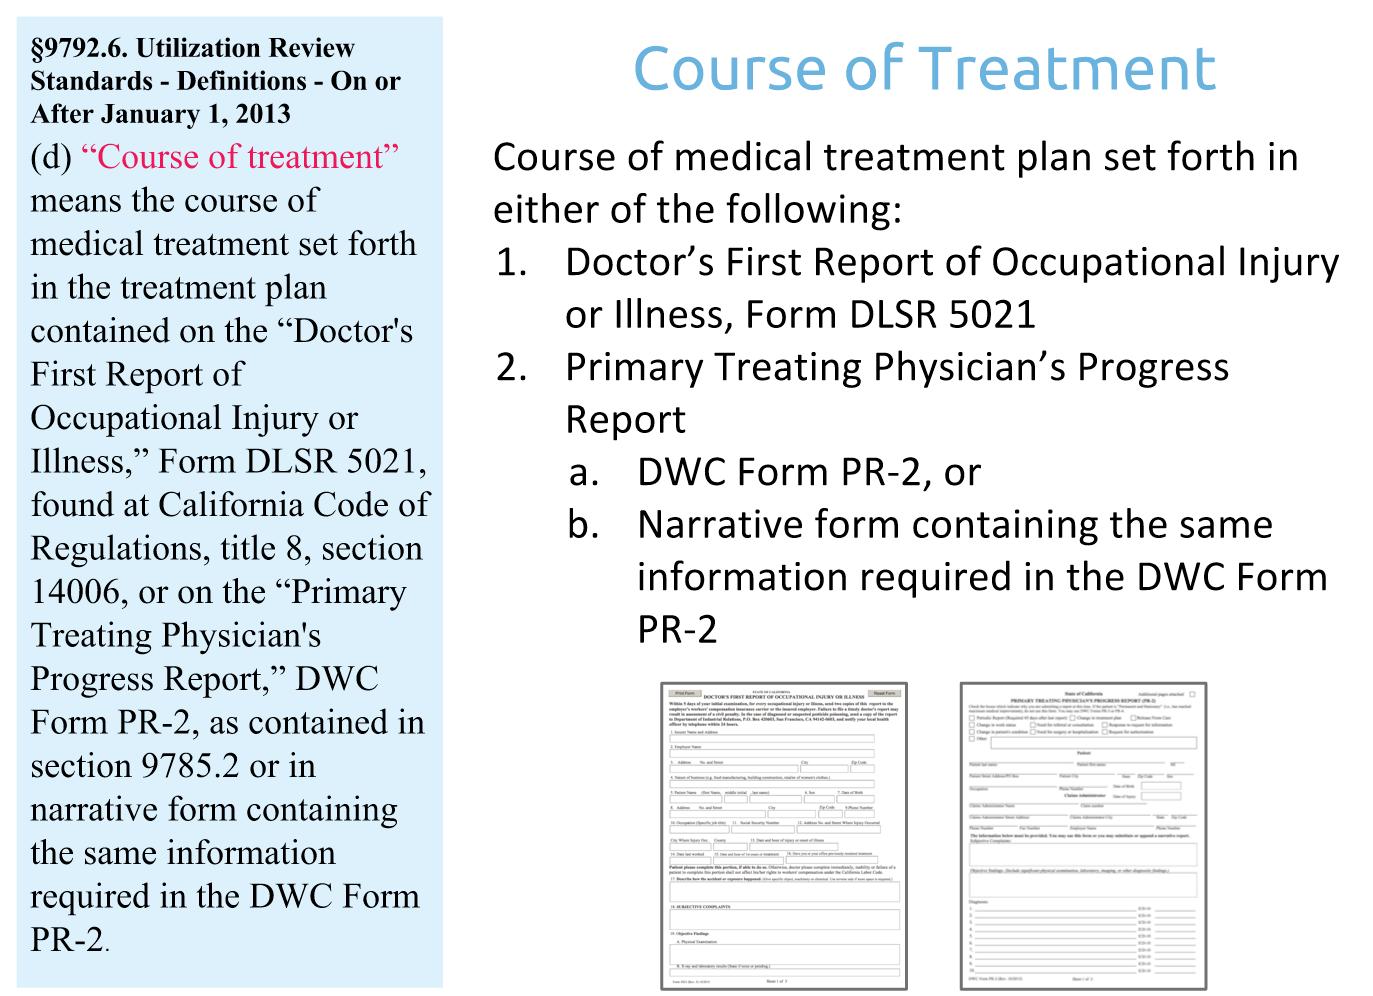 Course of Treatment RFA